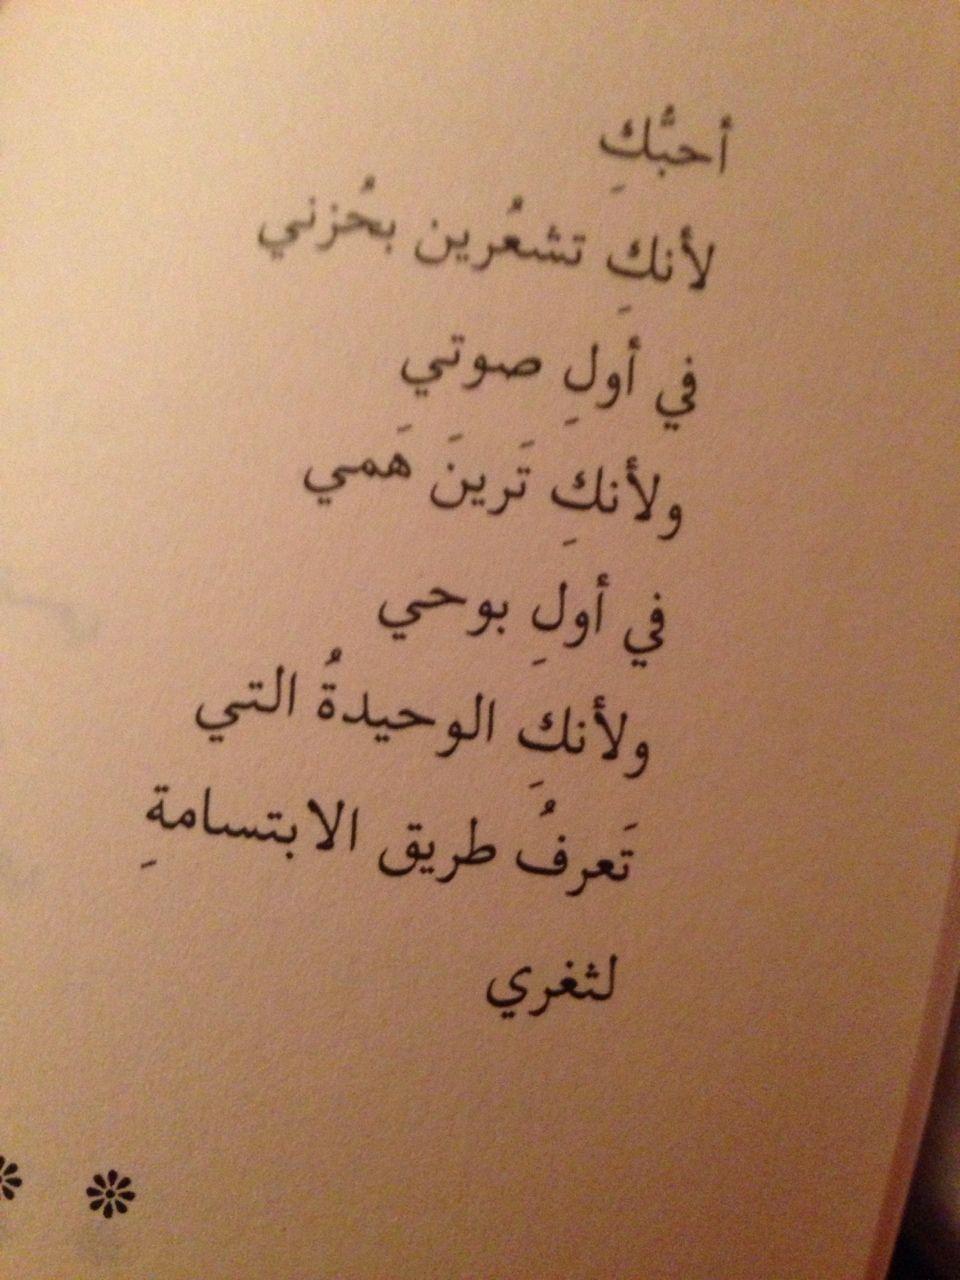 دي اختي وصاحبتي Arabic Tattoo Quotes Queen Quotes Book Quotes